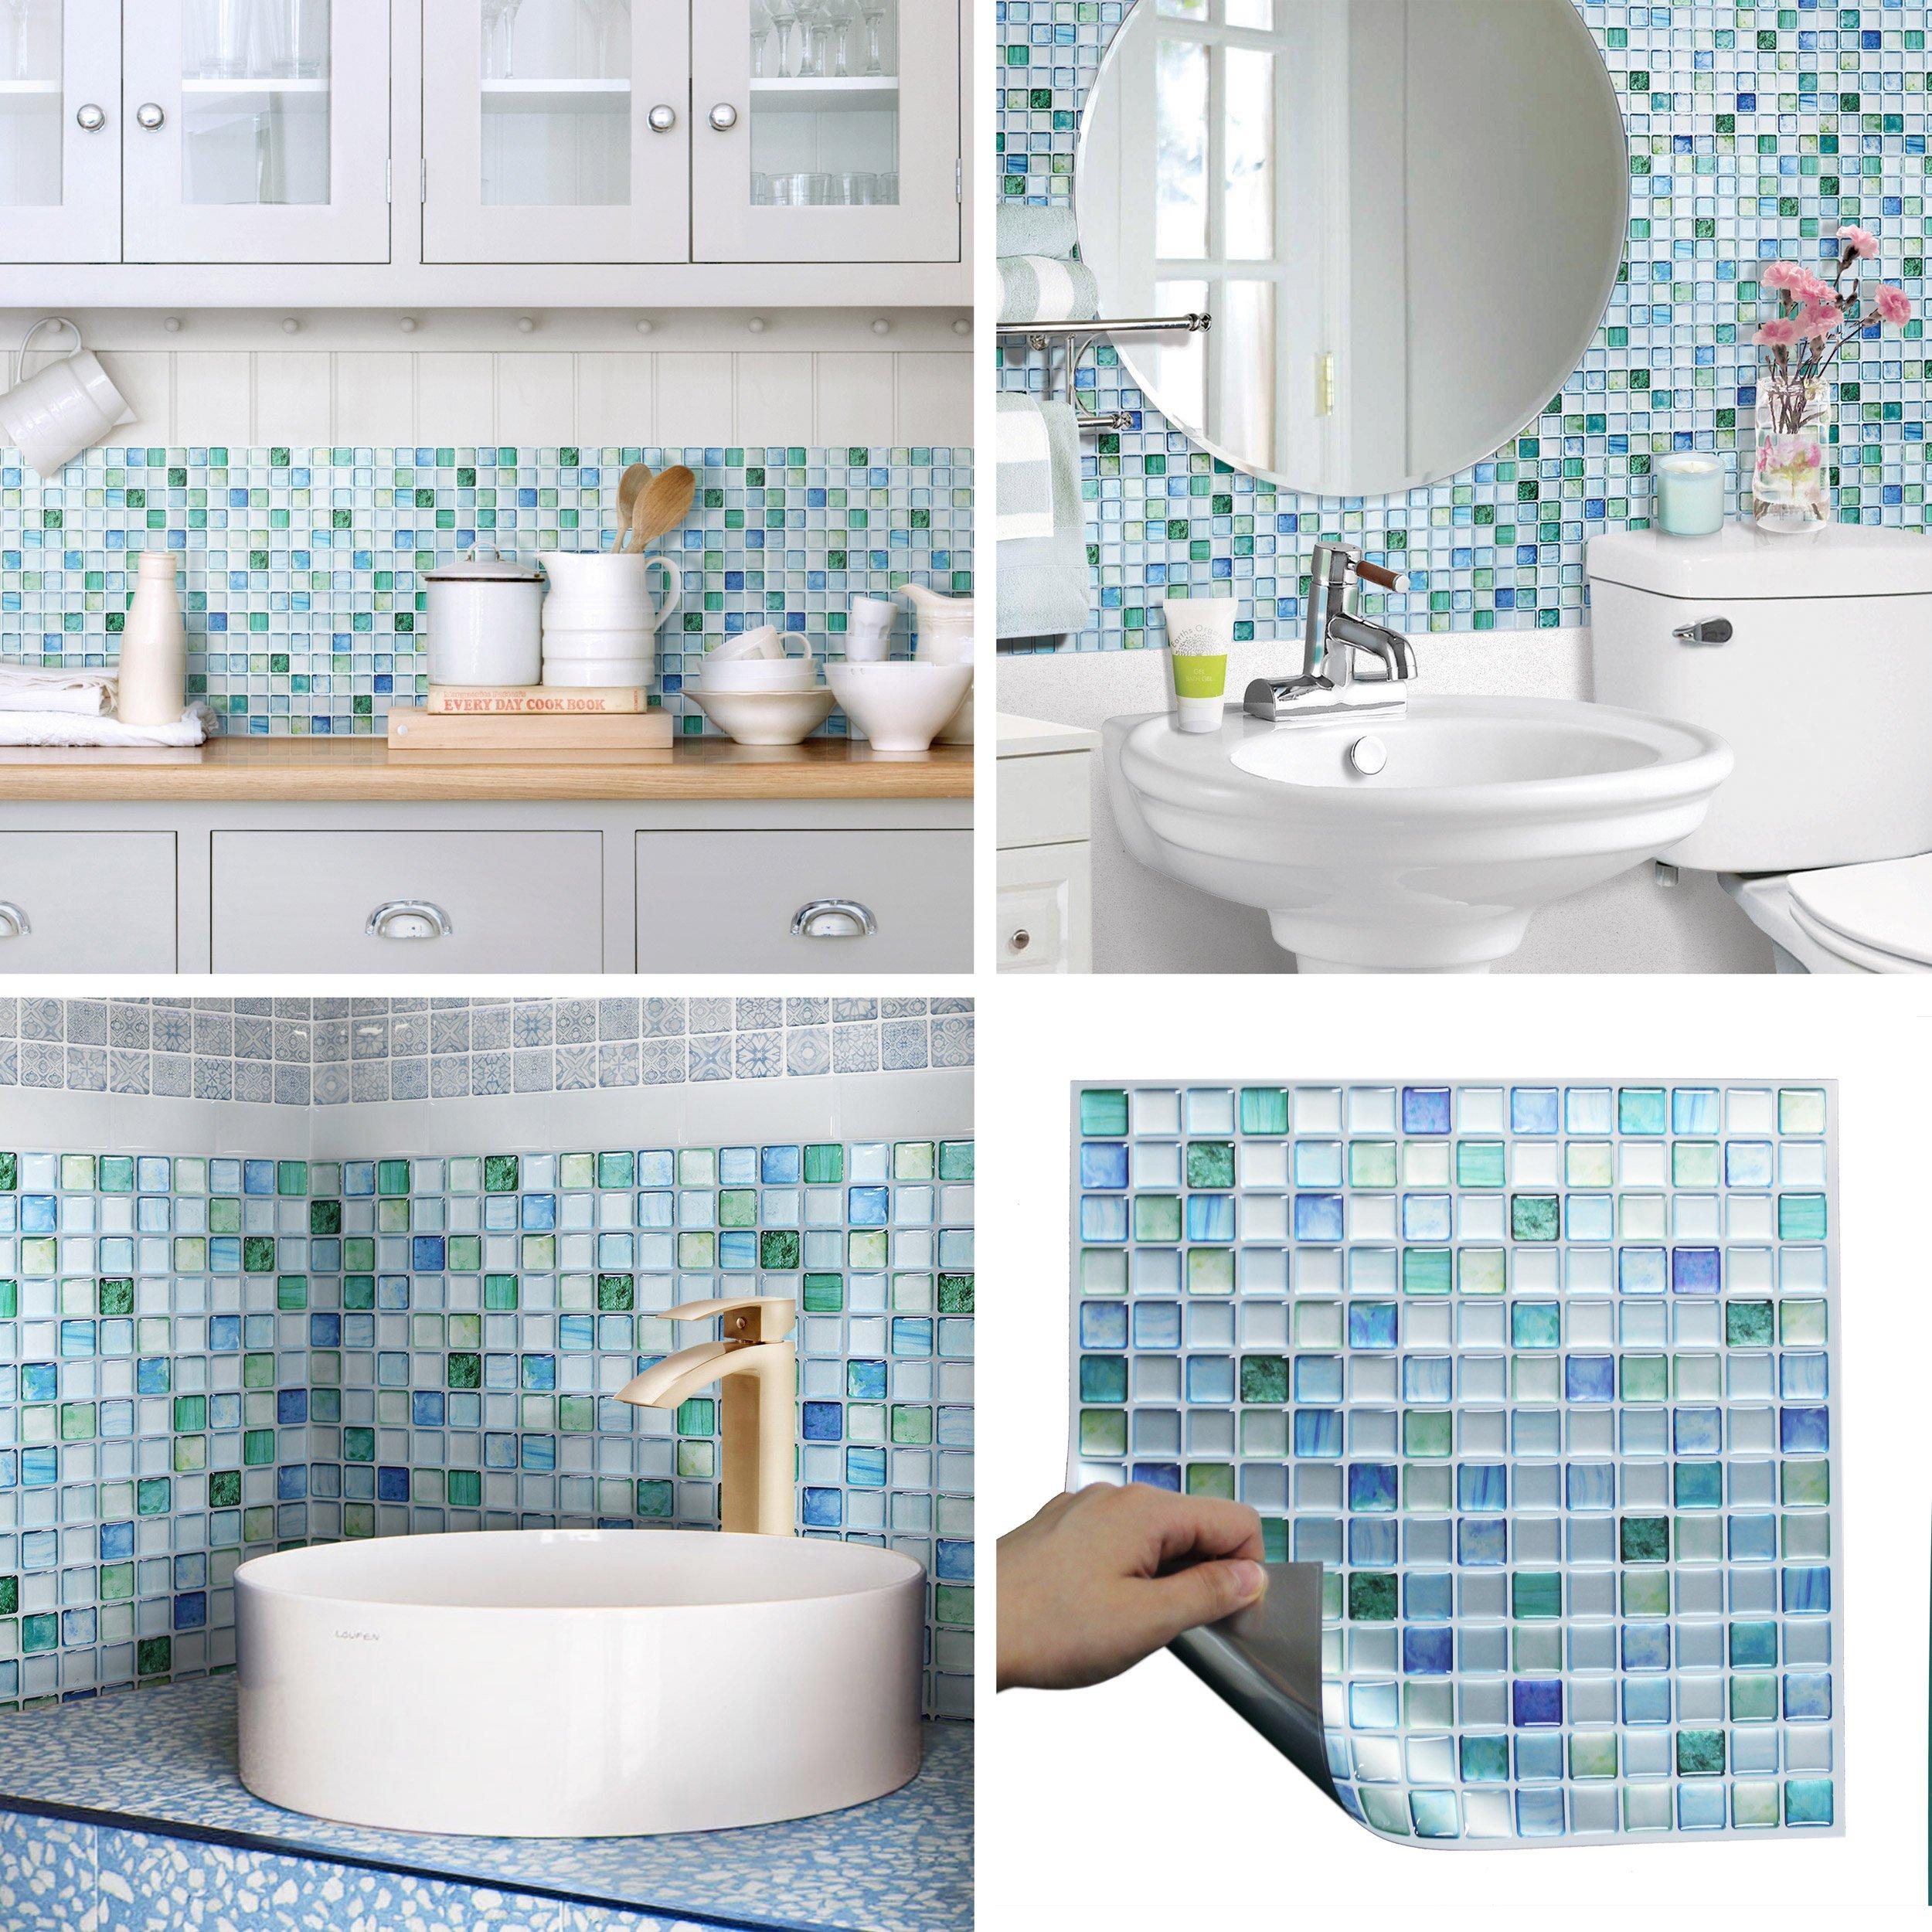 Beaustile Decorative Tile Stickers Peel Stick Backsplash Fire Retardant Tile Sheet (Sapphire Blue) (5pcs)